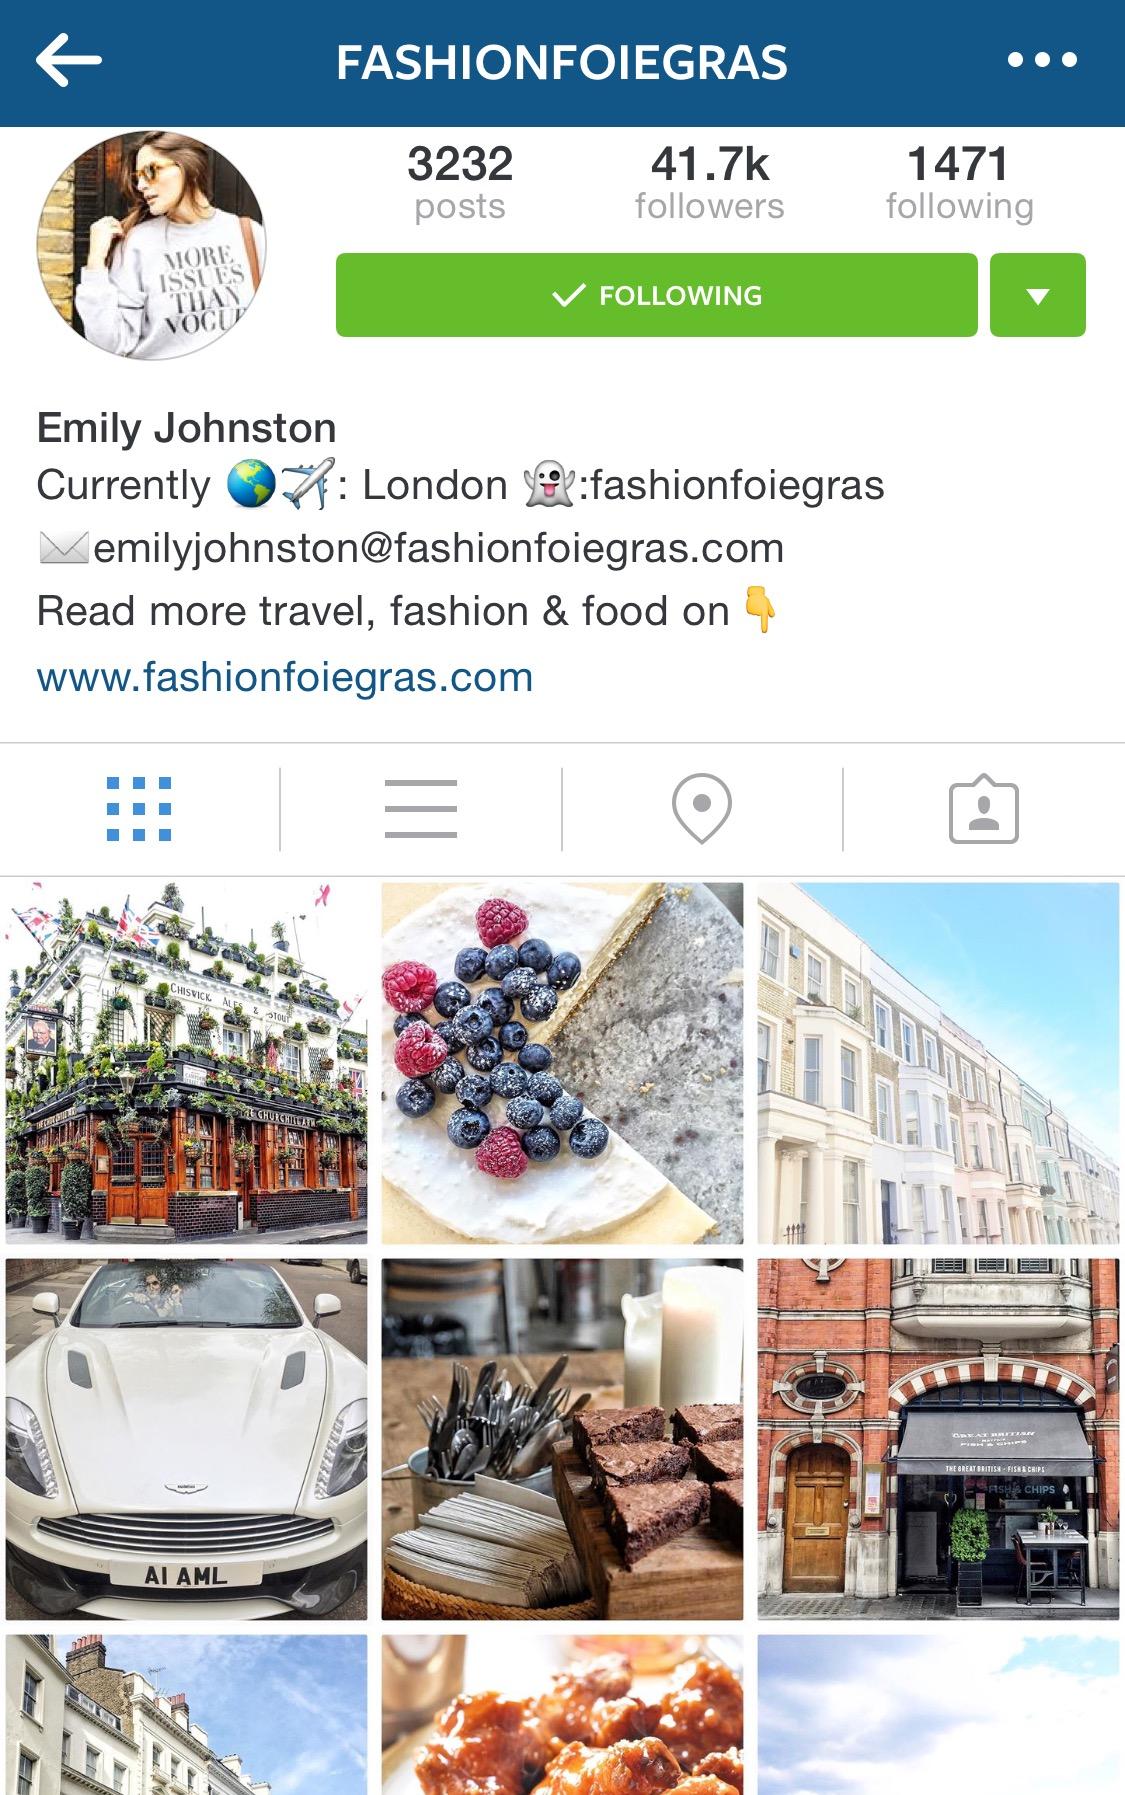 Fashionfoiegras magazine blog